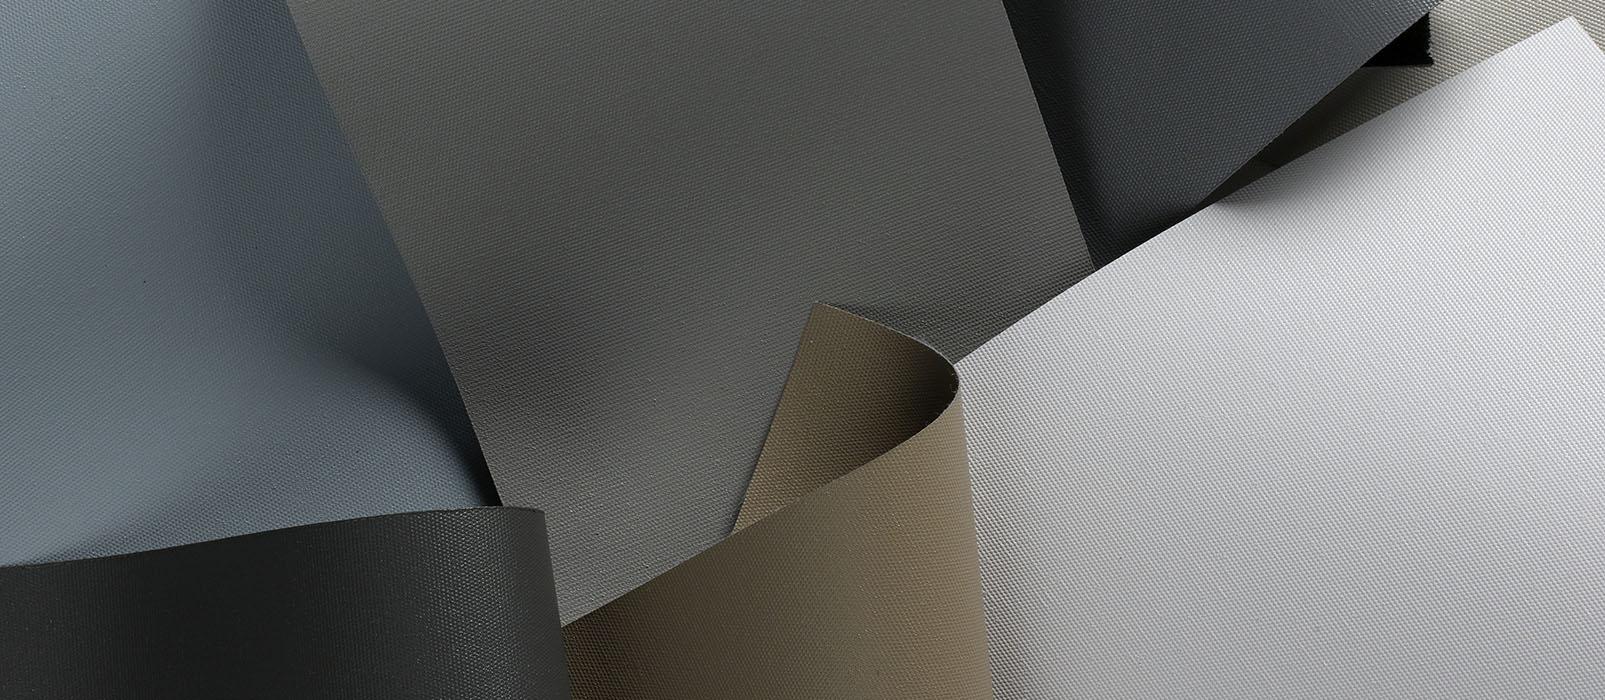 Component - Products - Fabrics - Zen Banner